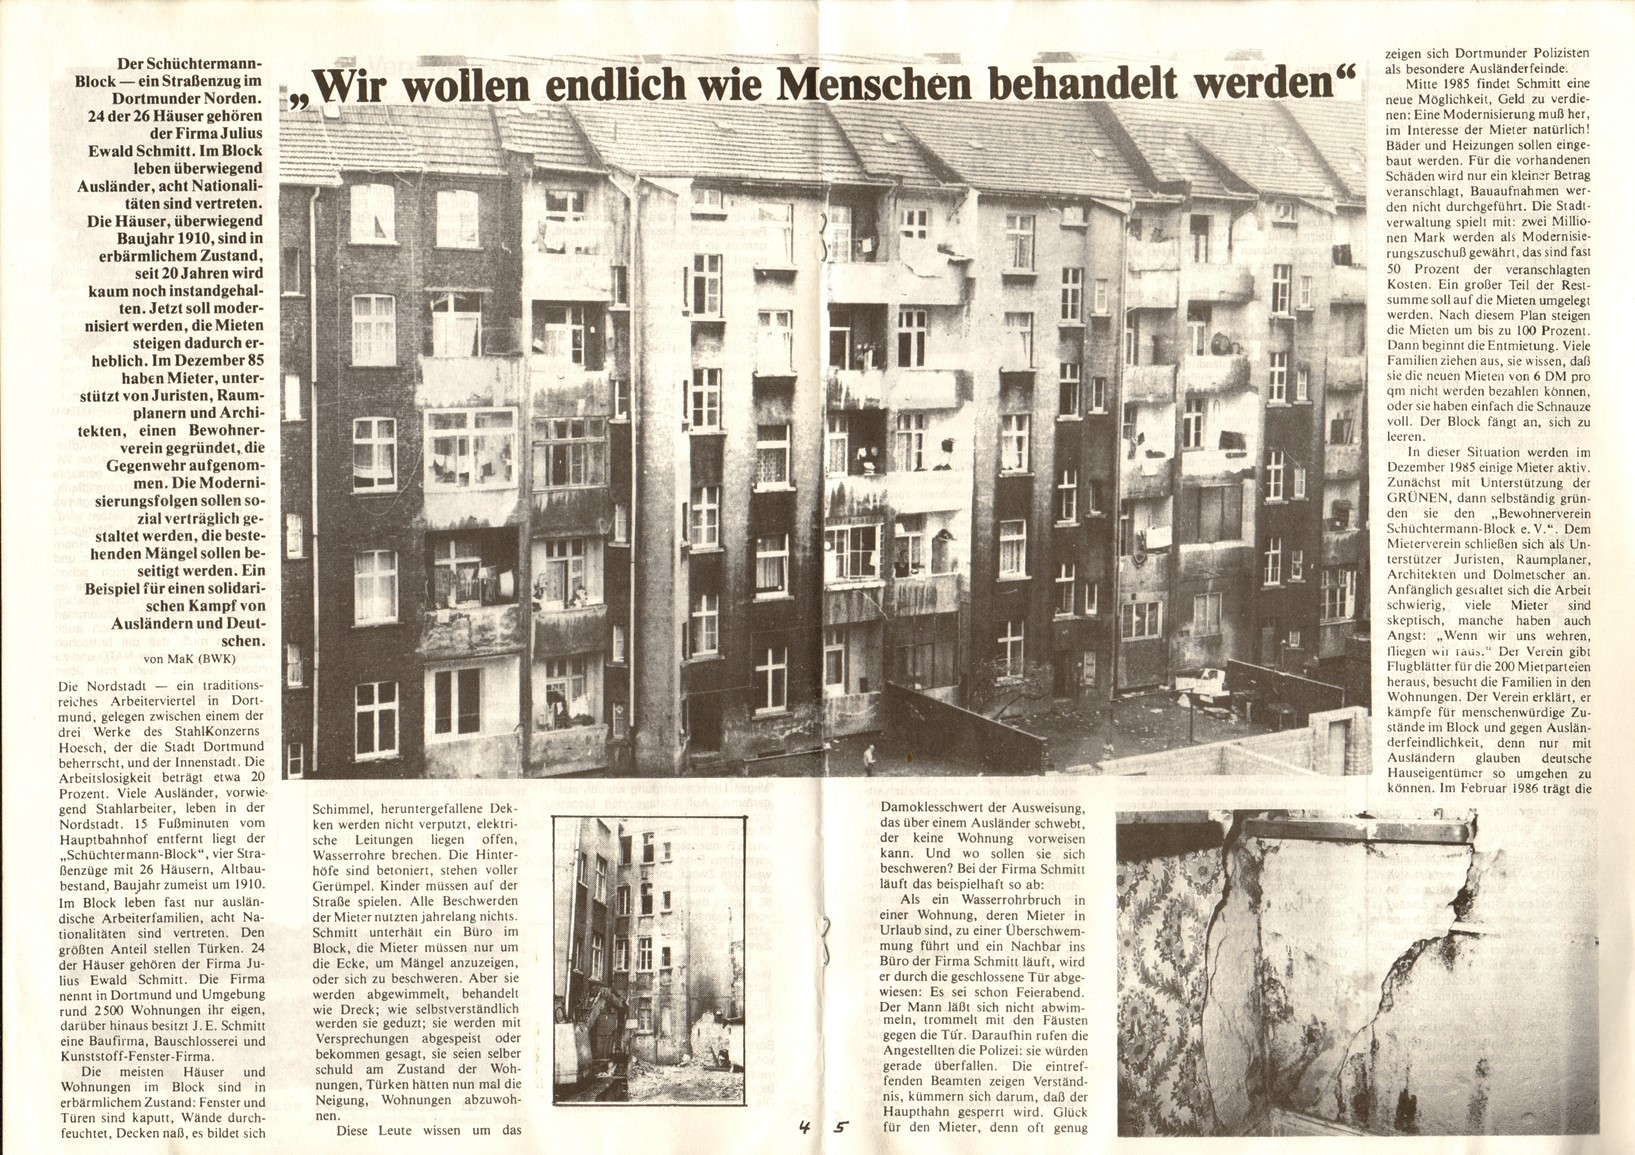 Dortmund_Pottkieker_19860700_03